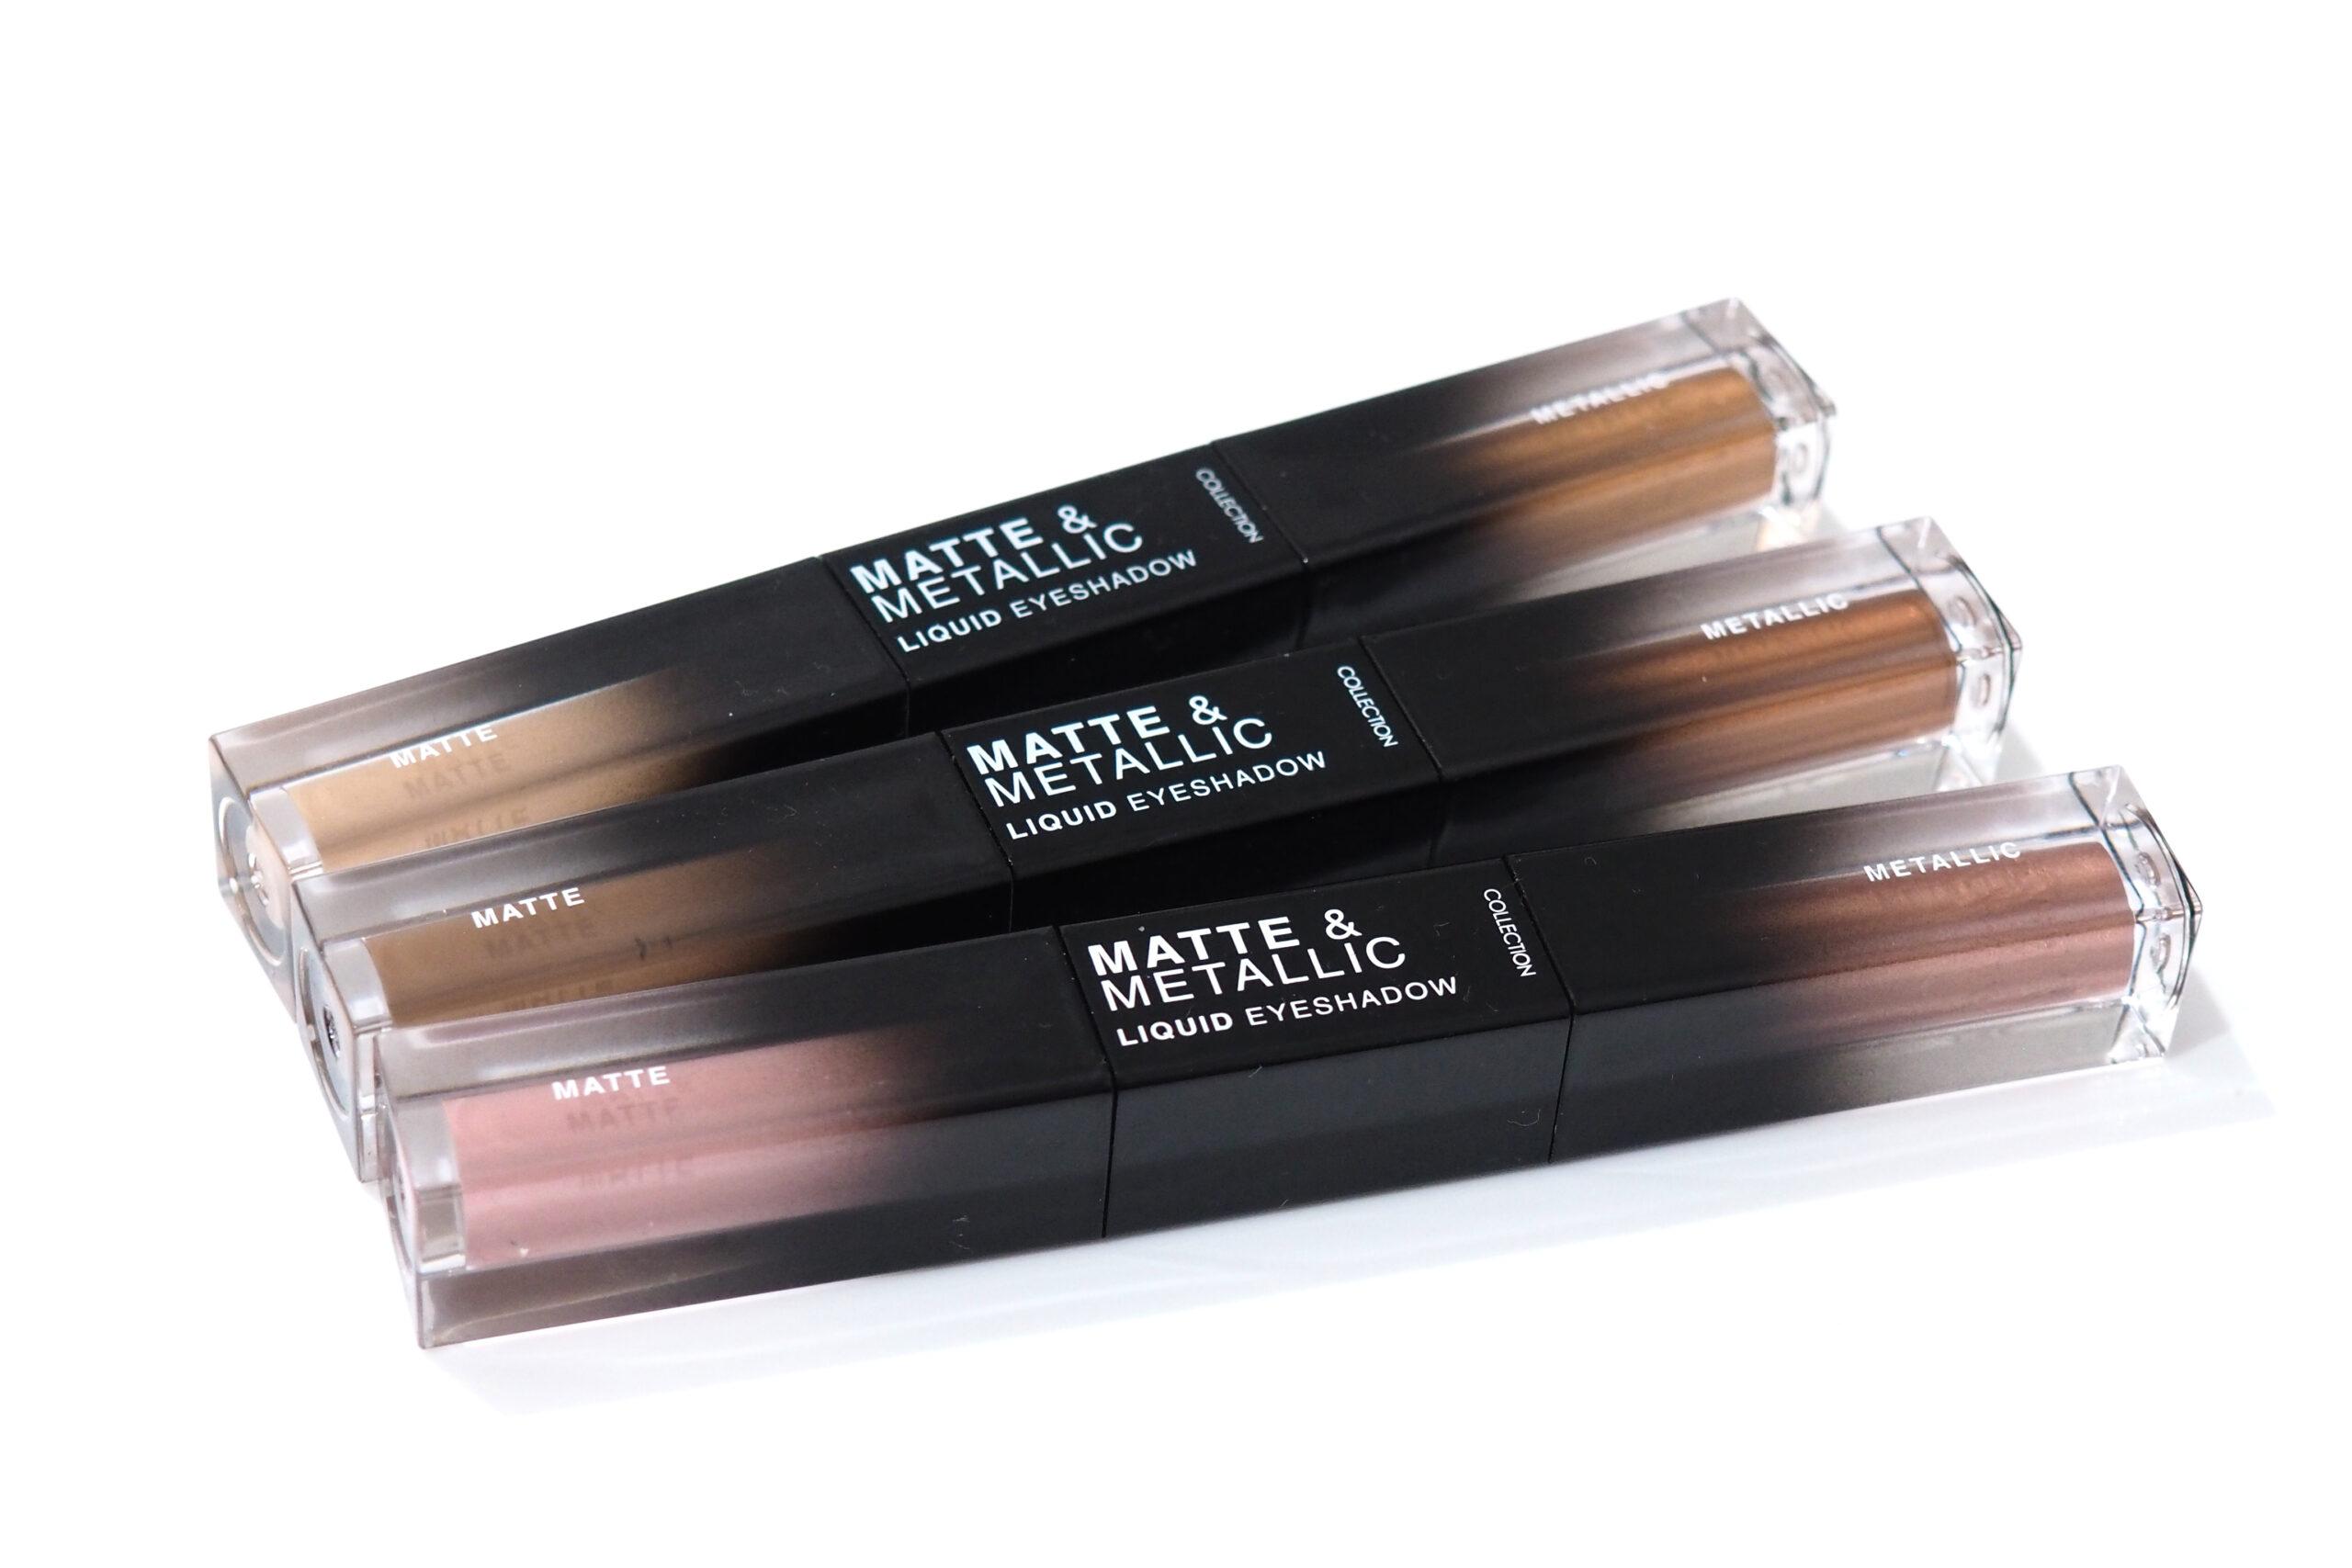 Collection Matte & Metallic Liquid Eyeshadow Duos